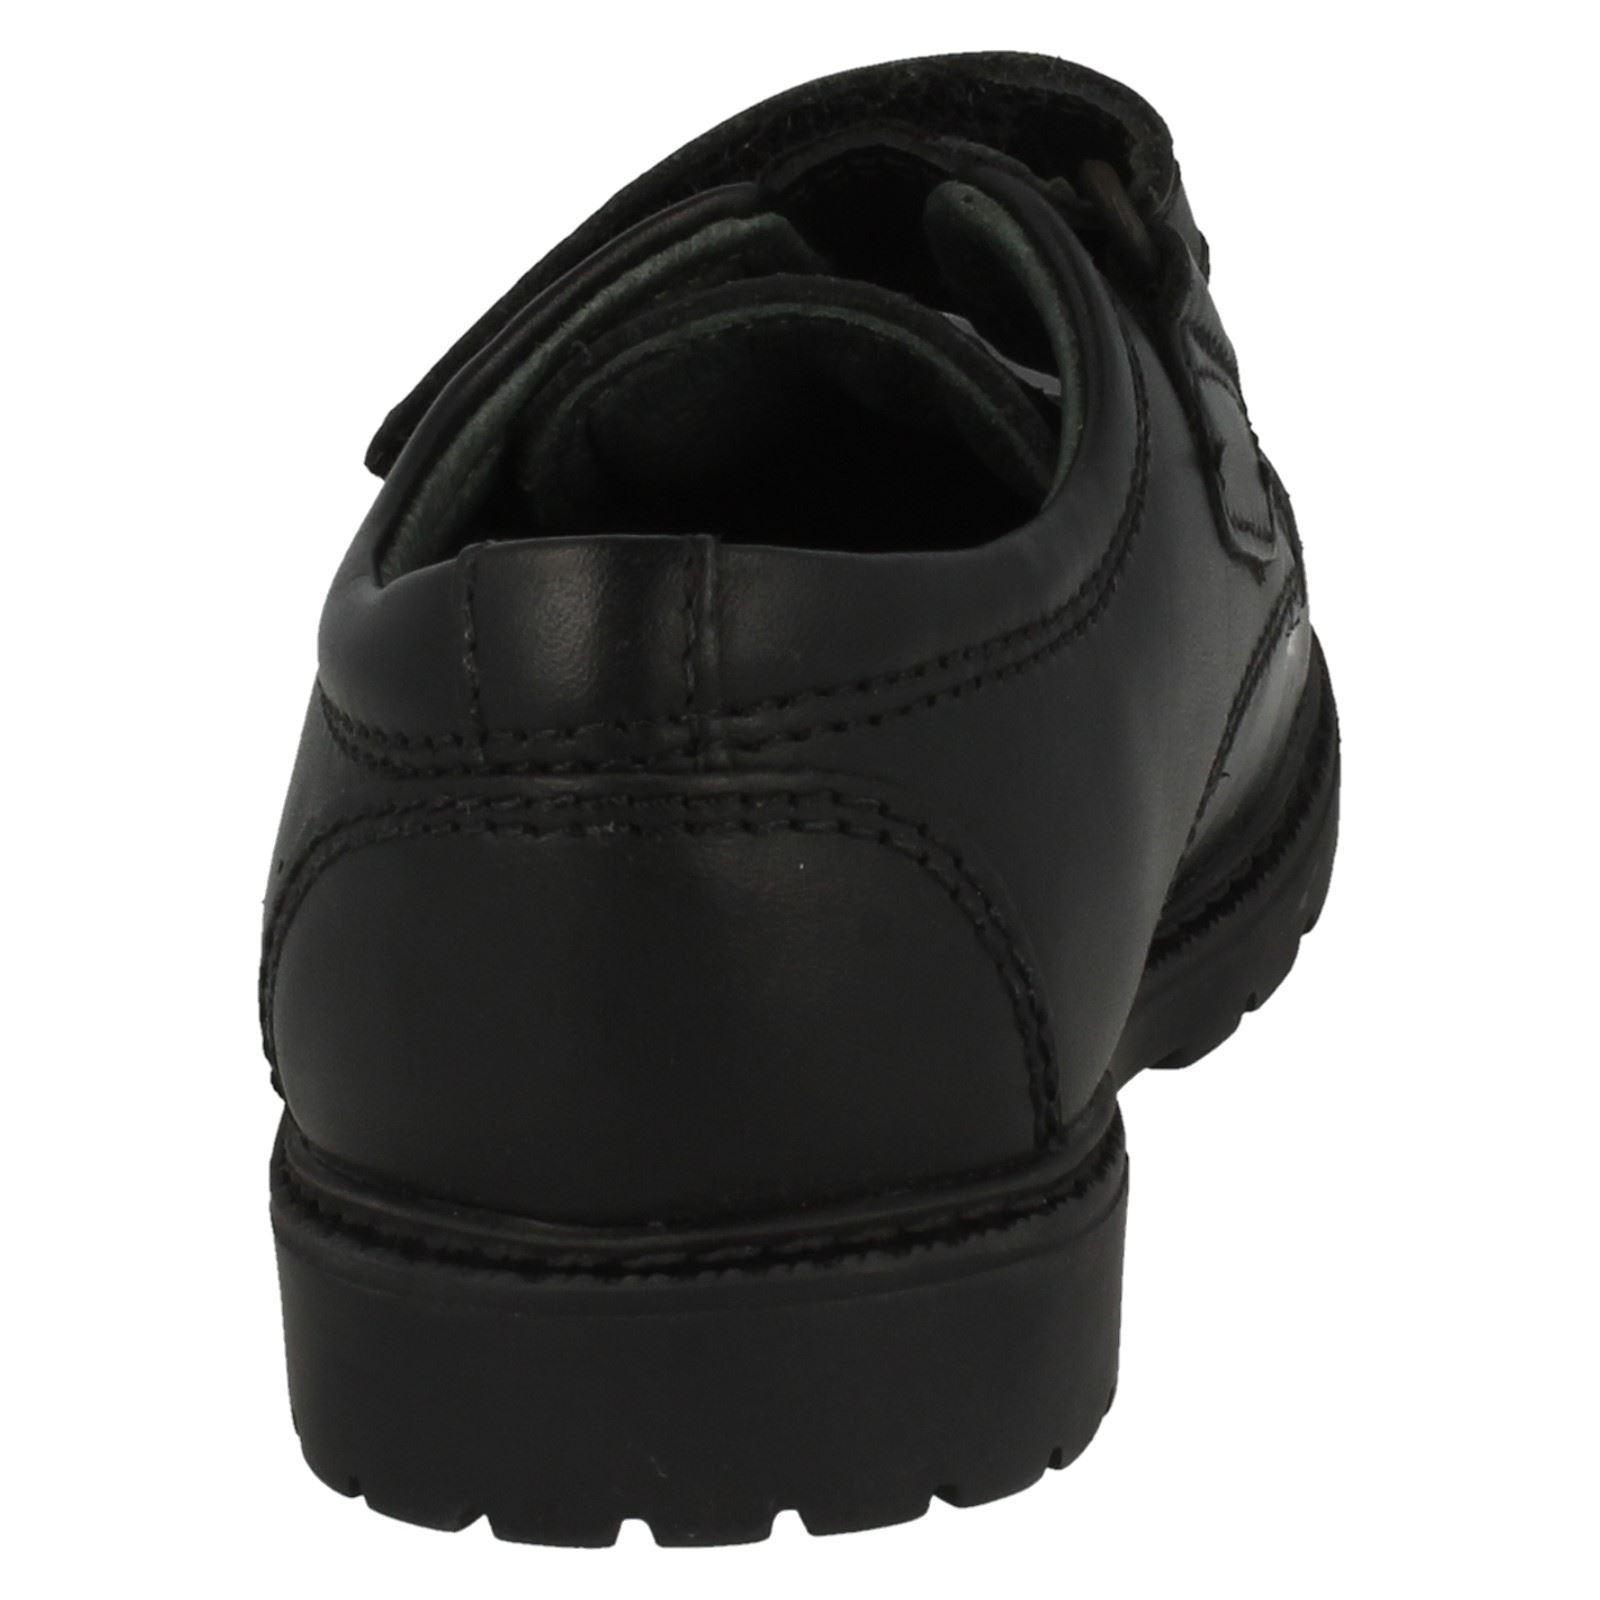 Startrite Shoes School I Smart saranno neri ragazzi w4nnTtB